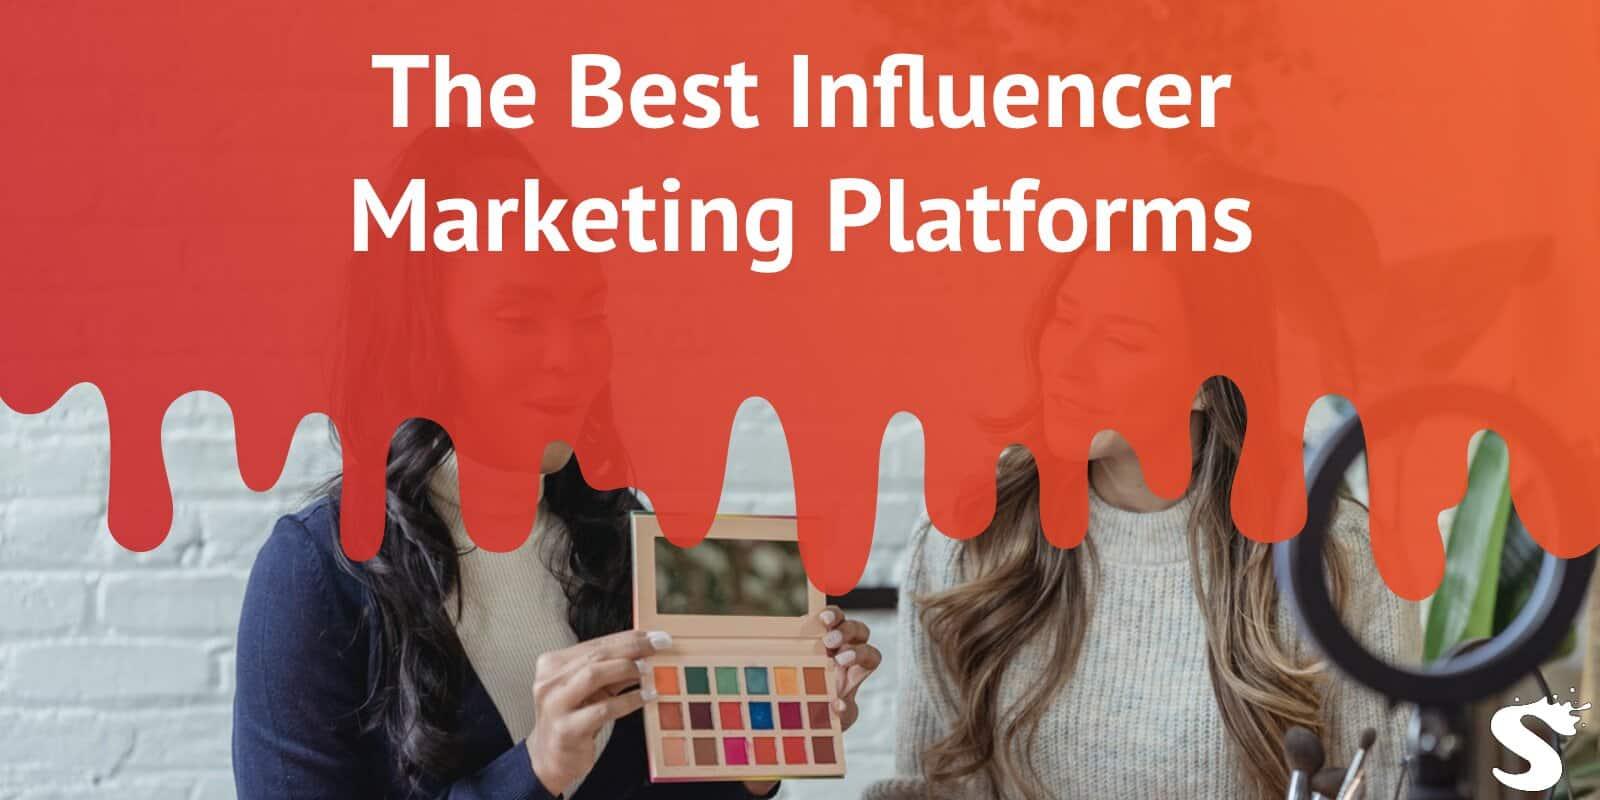 The Best Influencer Marketing Platforms